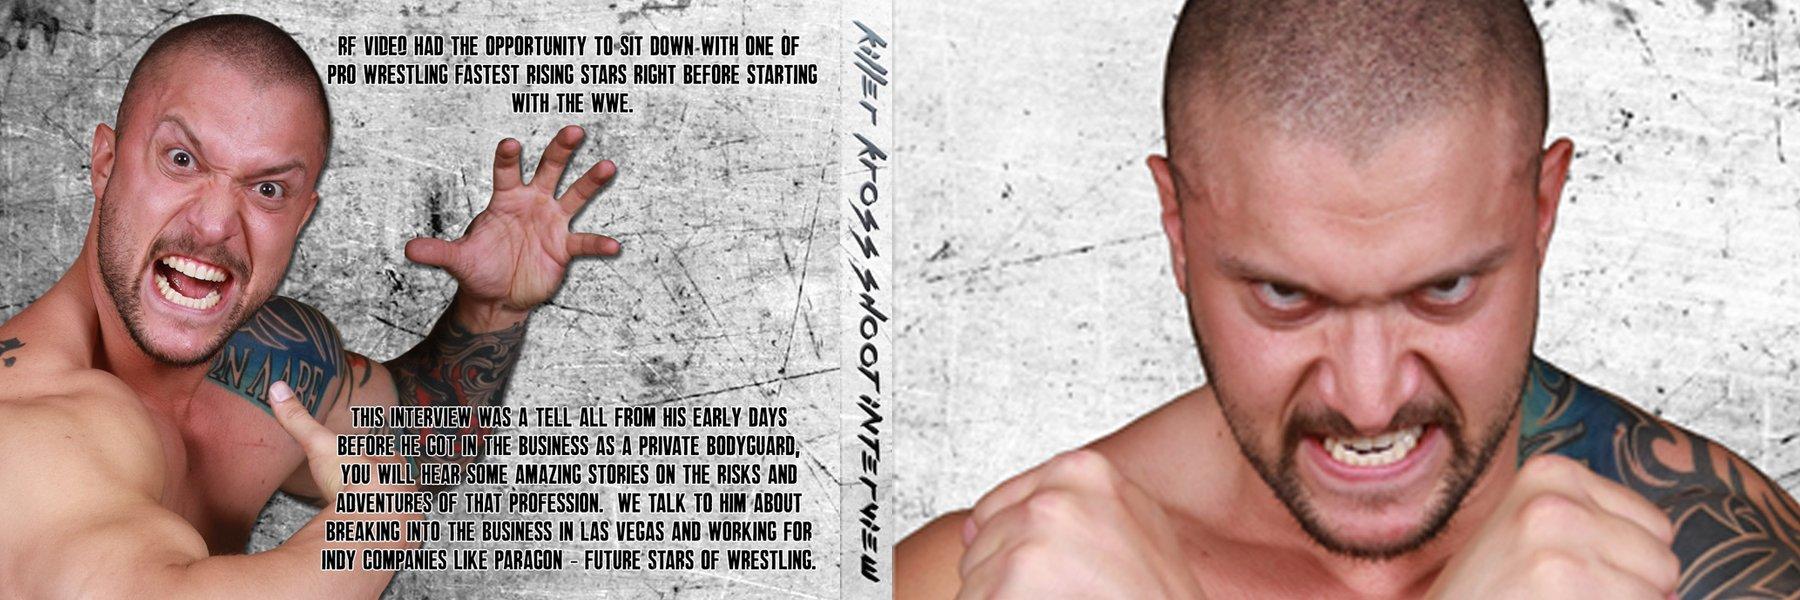 Just Released! WWE Star Killer Kross Shoot Interview (Feb 2020)